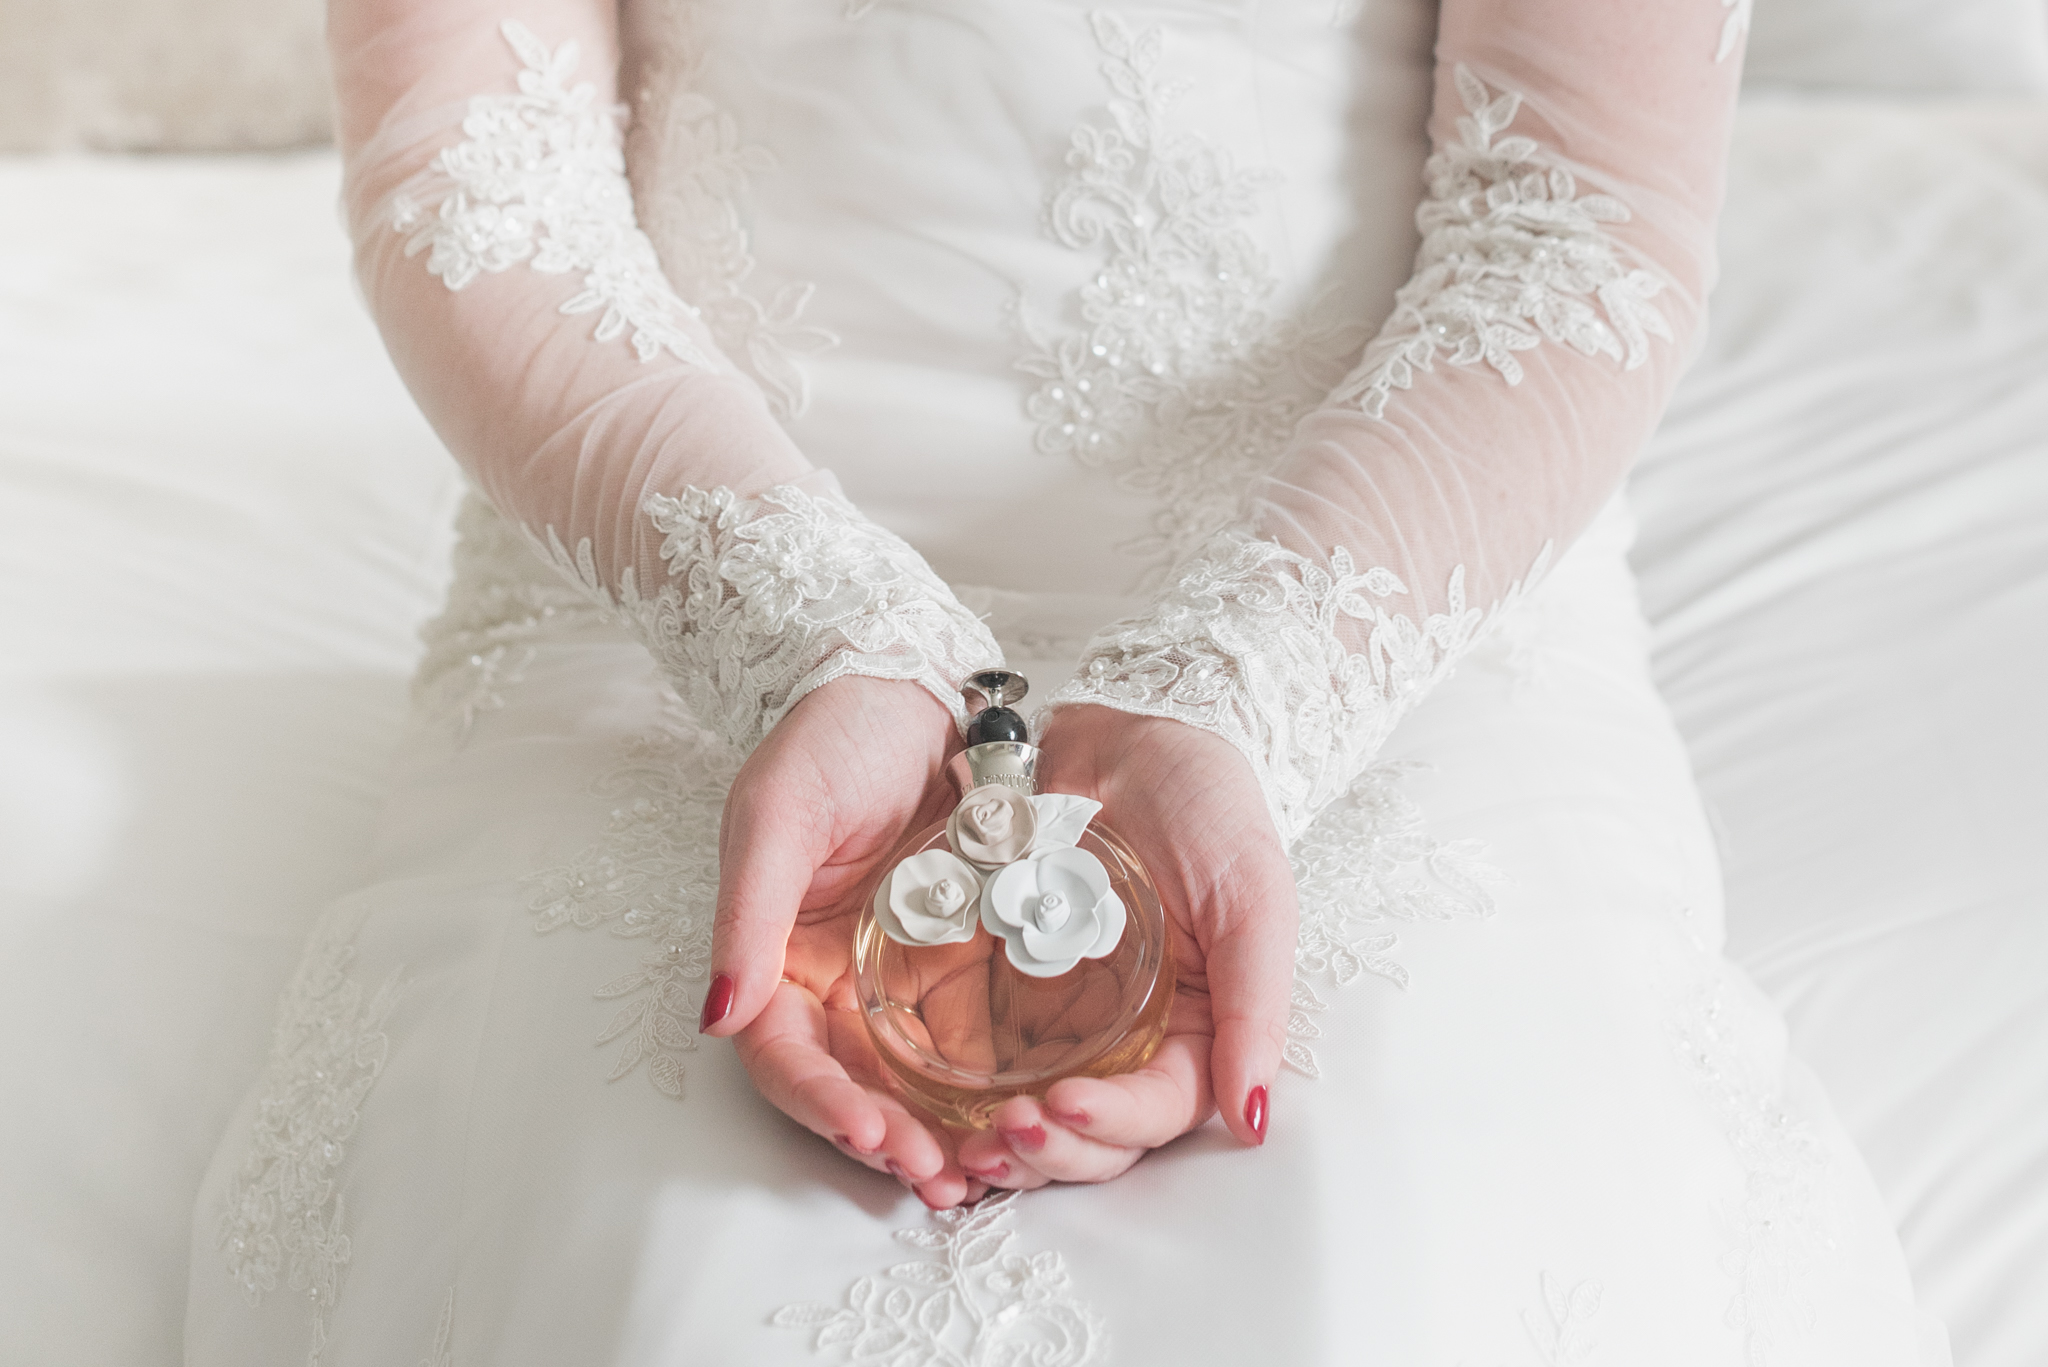 Angelique_Smith_Photography_Pieter&Yvonne_Wedding-91.jpg